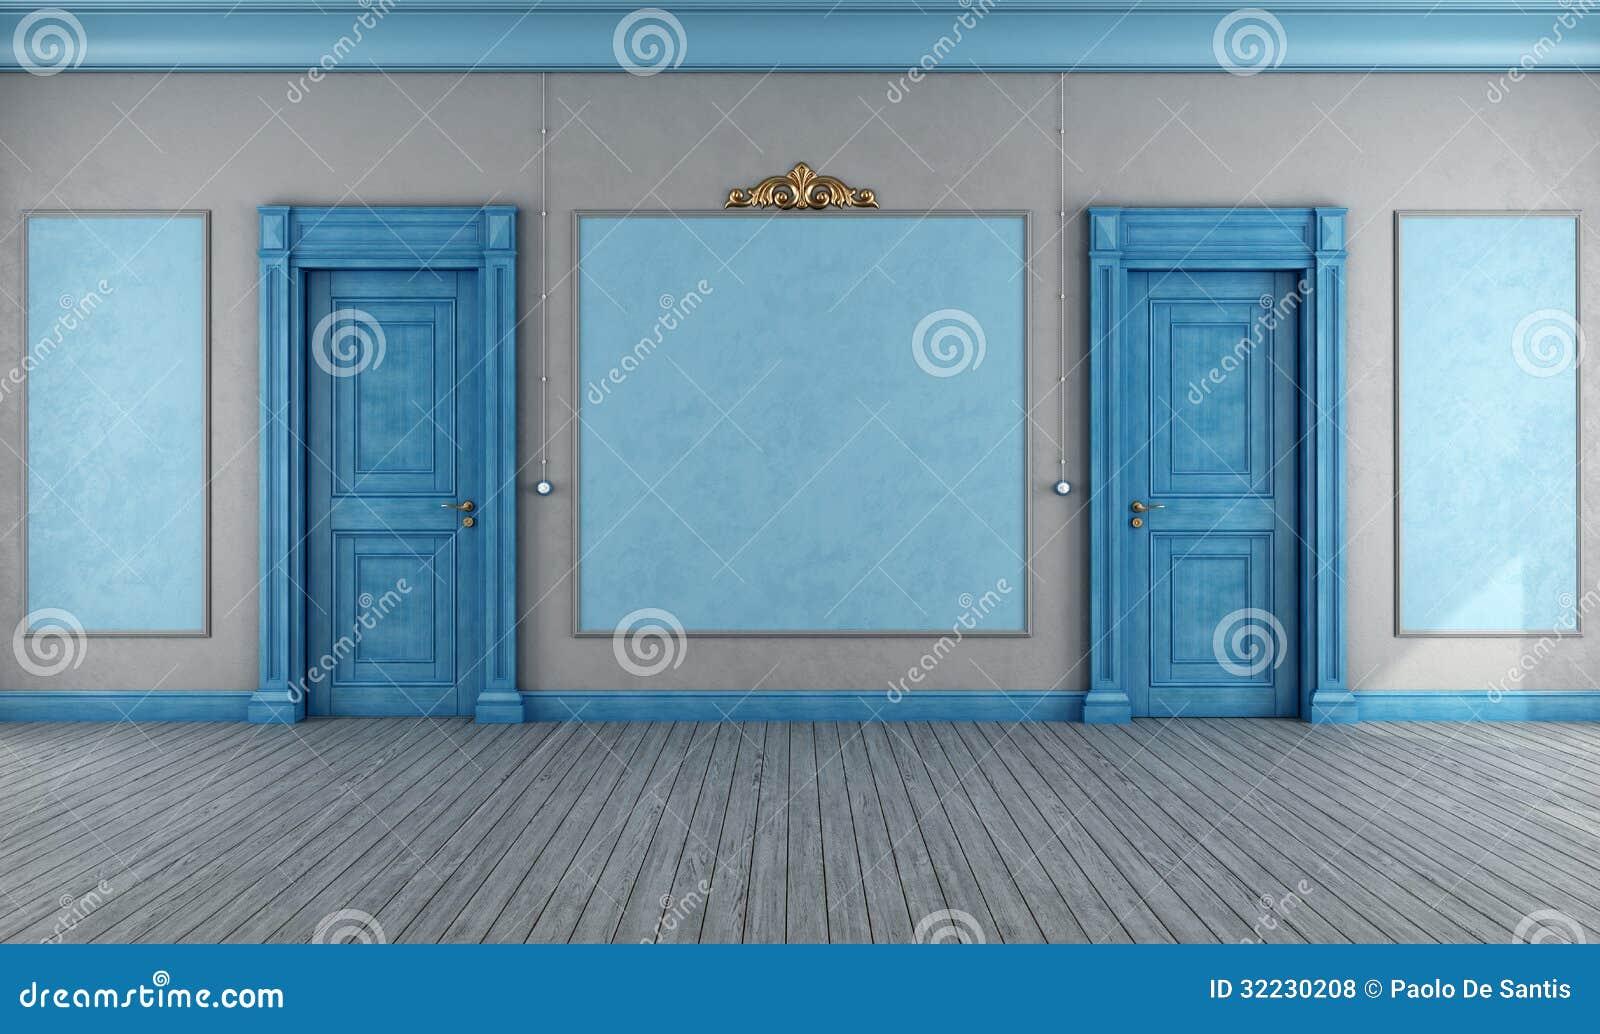 Empty blue vintage interior royalty free stock photos for Vintage internal doors